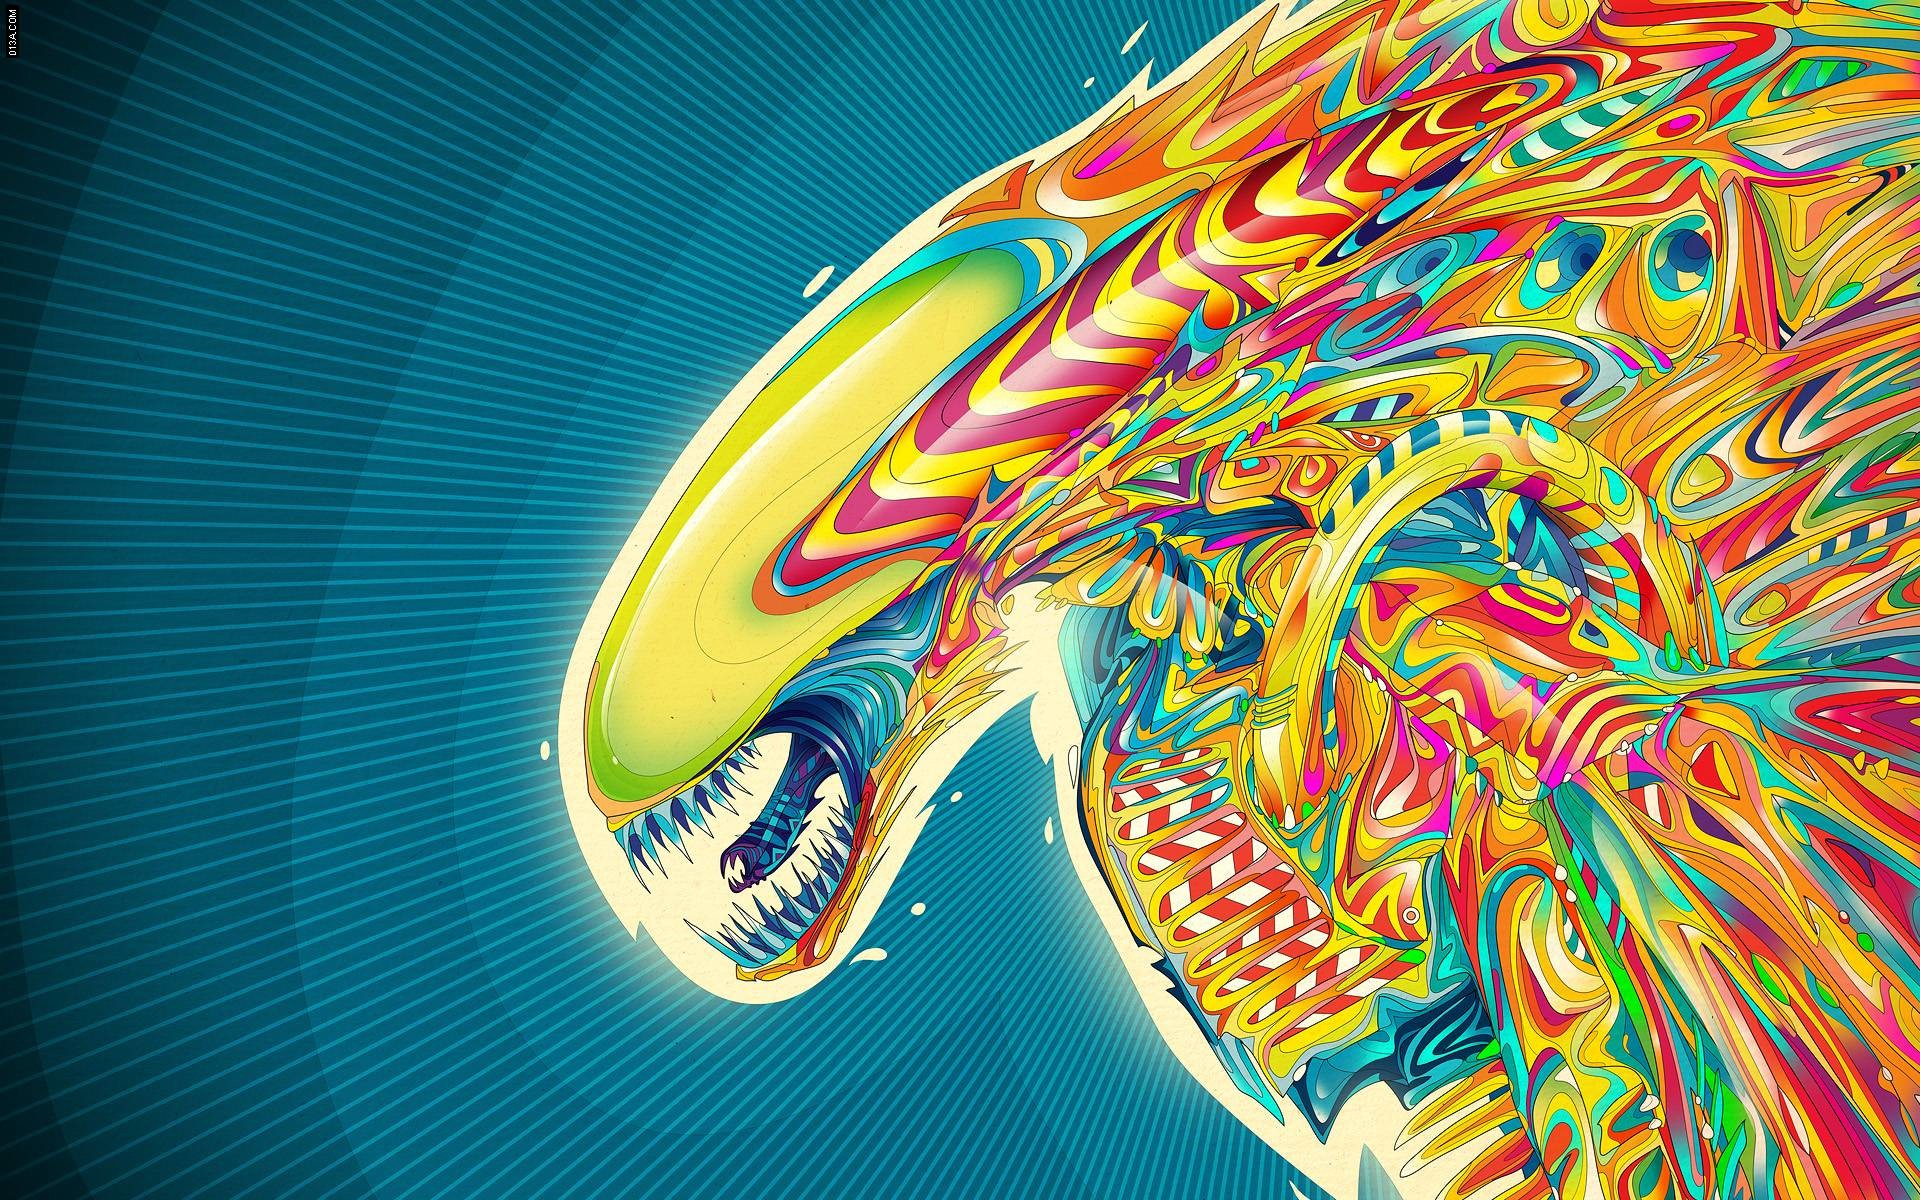 Colorful Skull Iphone Wallpaper Trippy Wallpaper Hd 183 ①